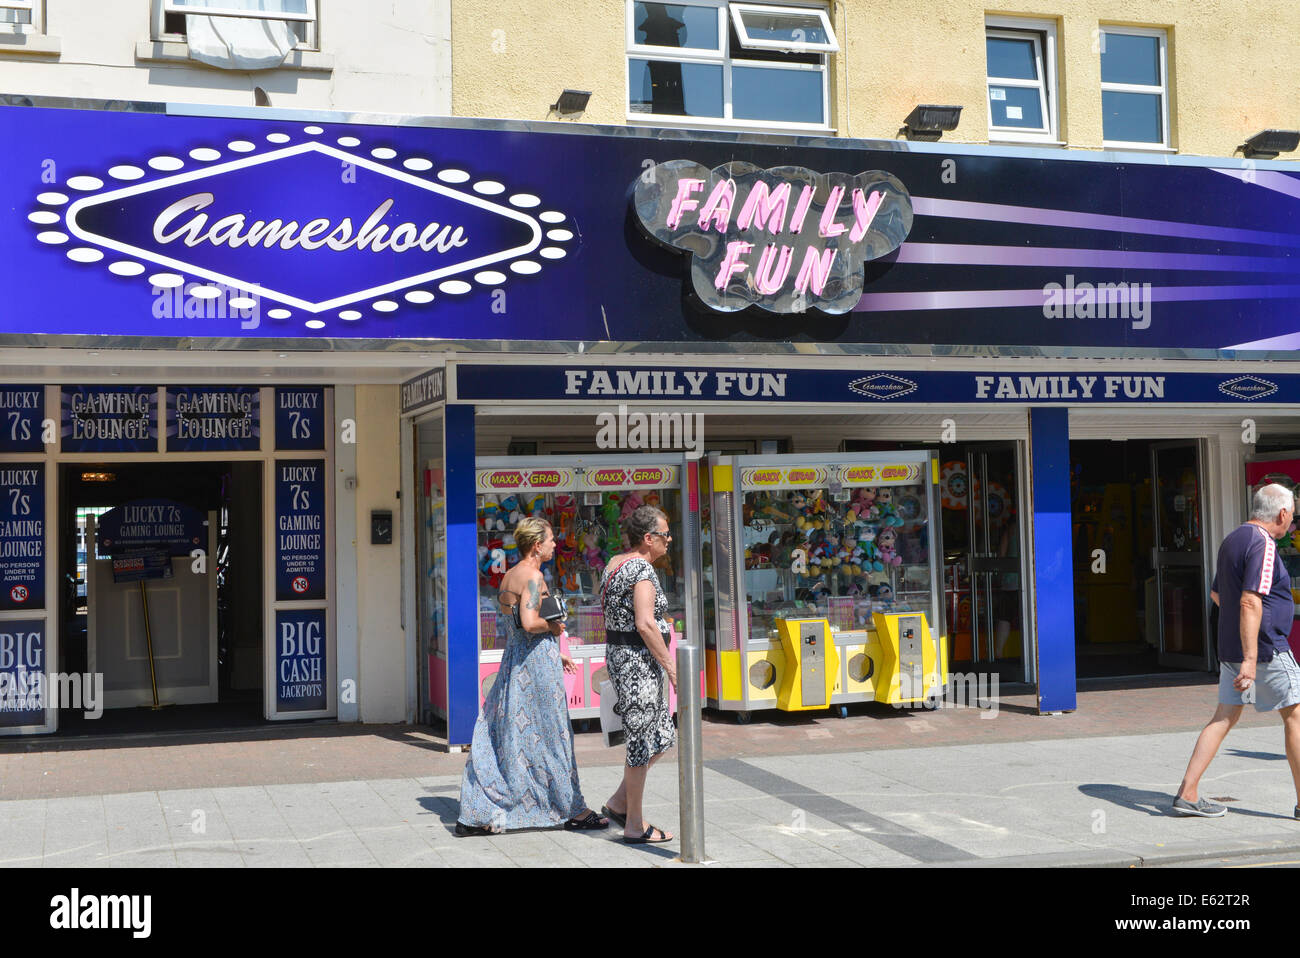 Amusement arcade Clacton on Sea England English holiday seaside town Essex - Stock Image